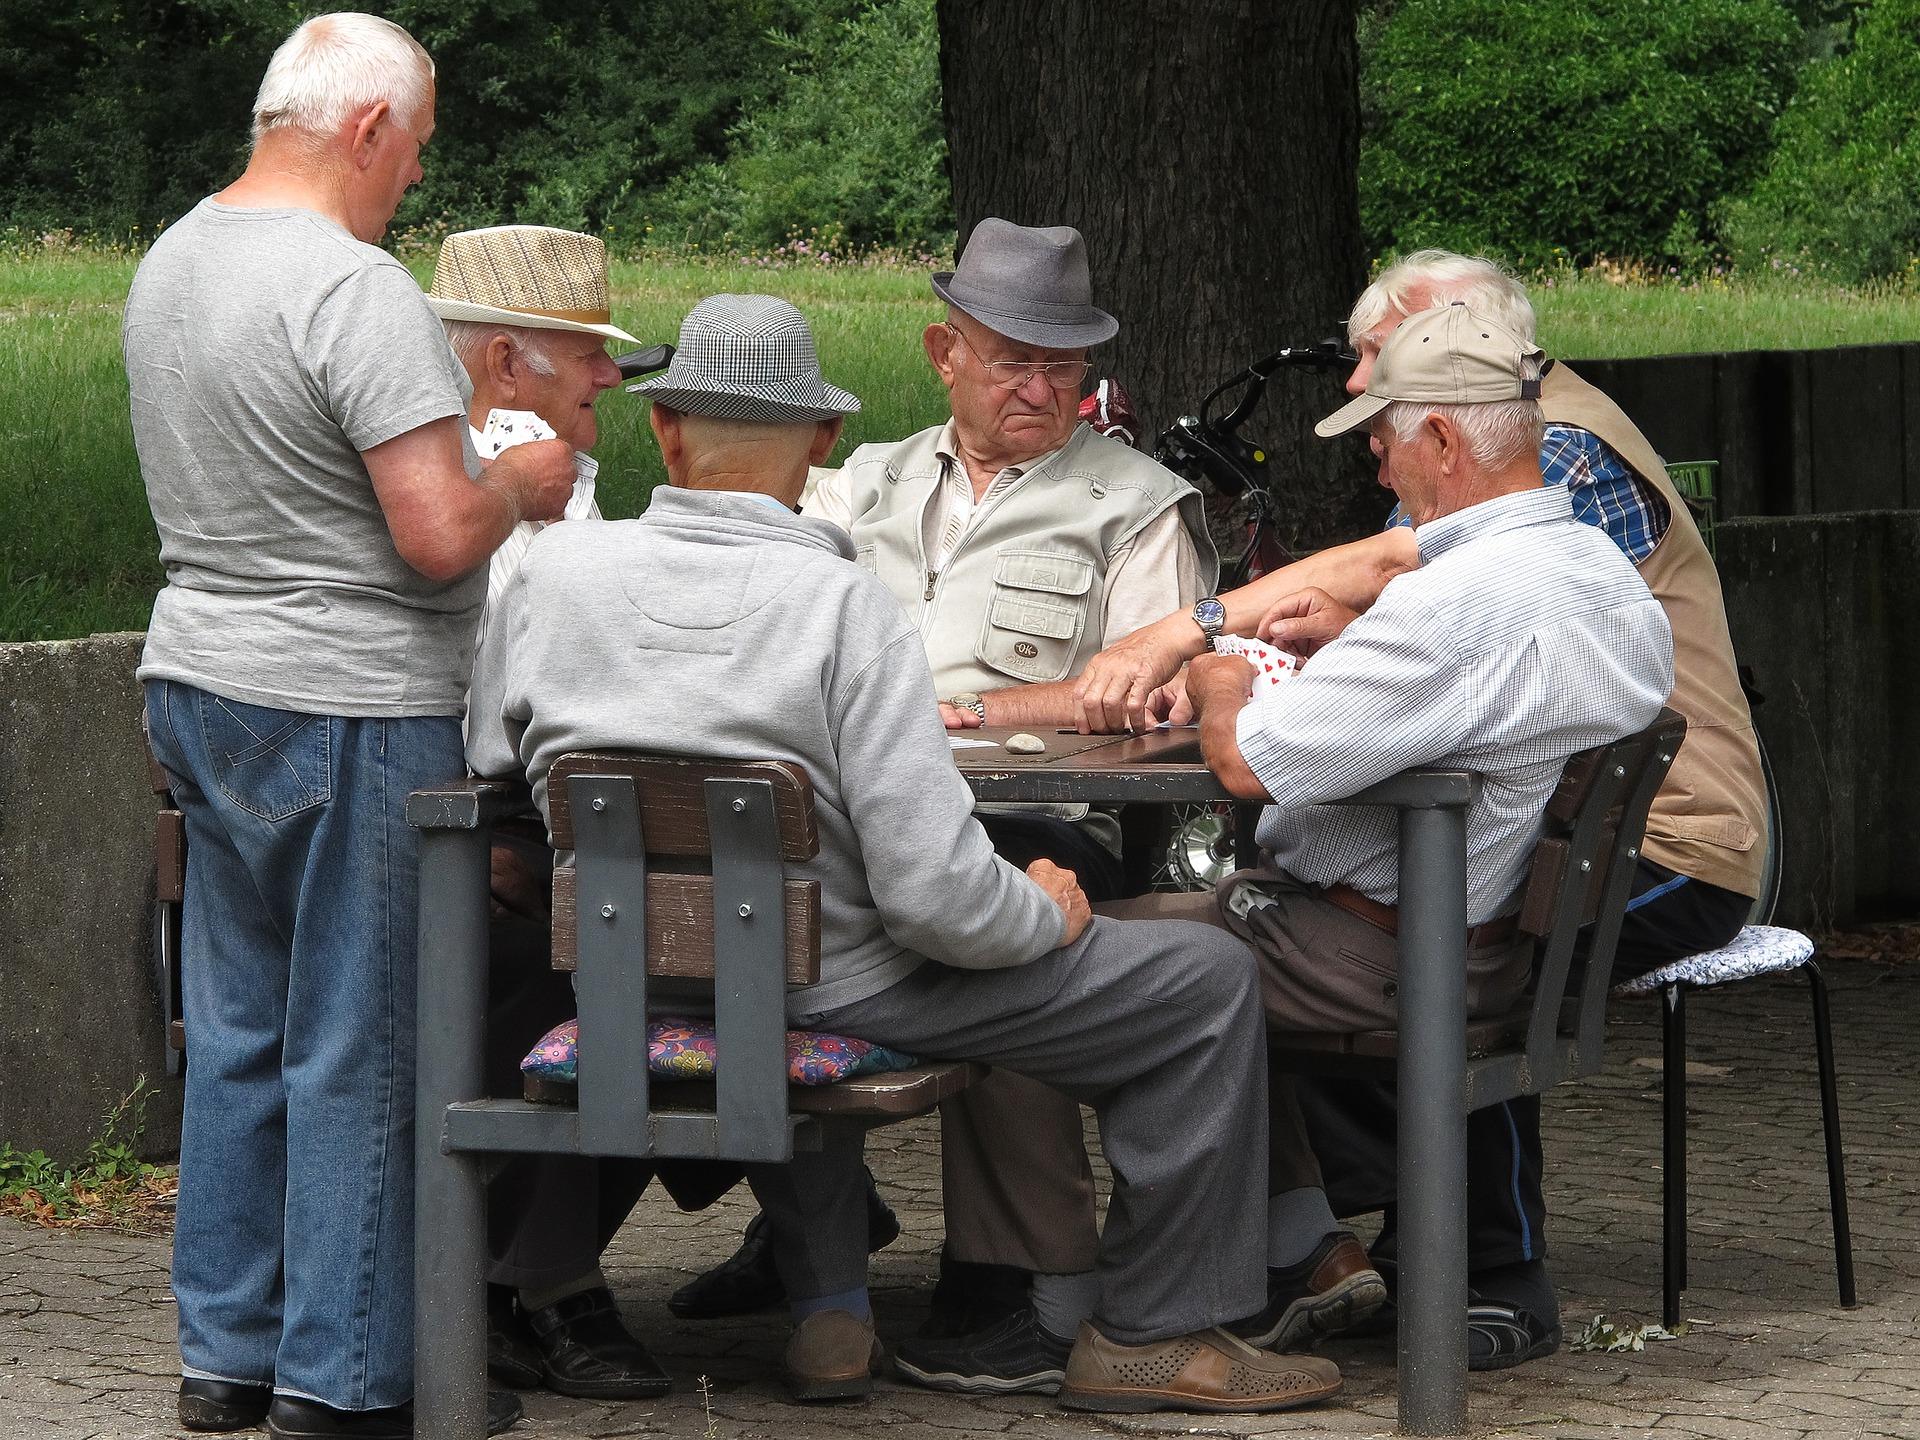 O que significa ser idoso hoje